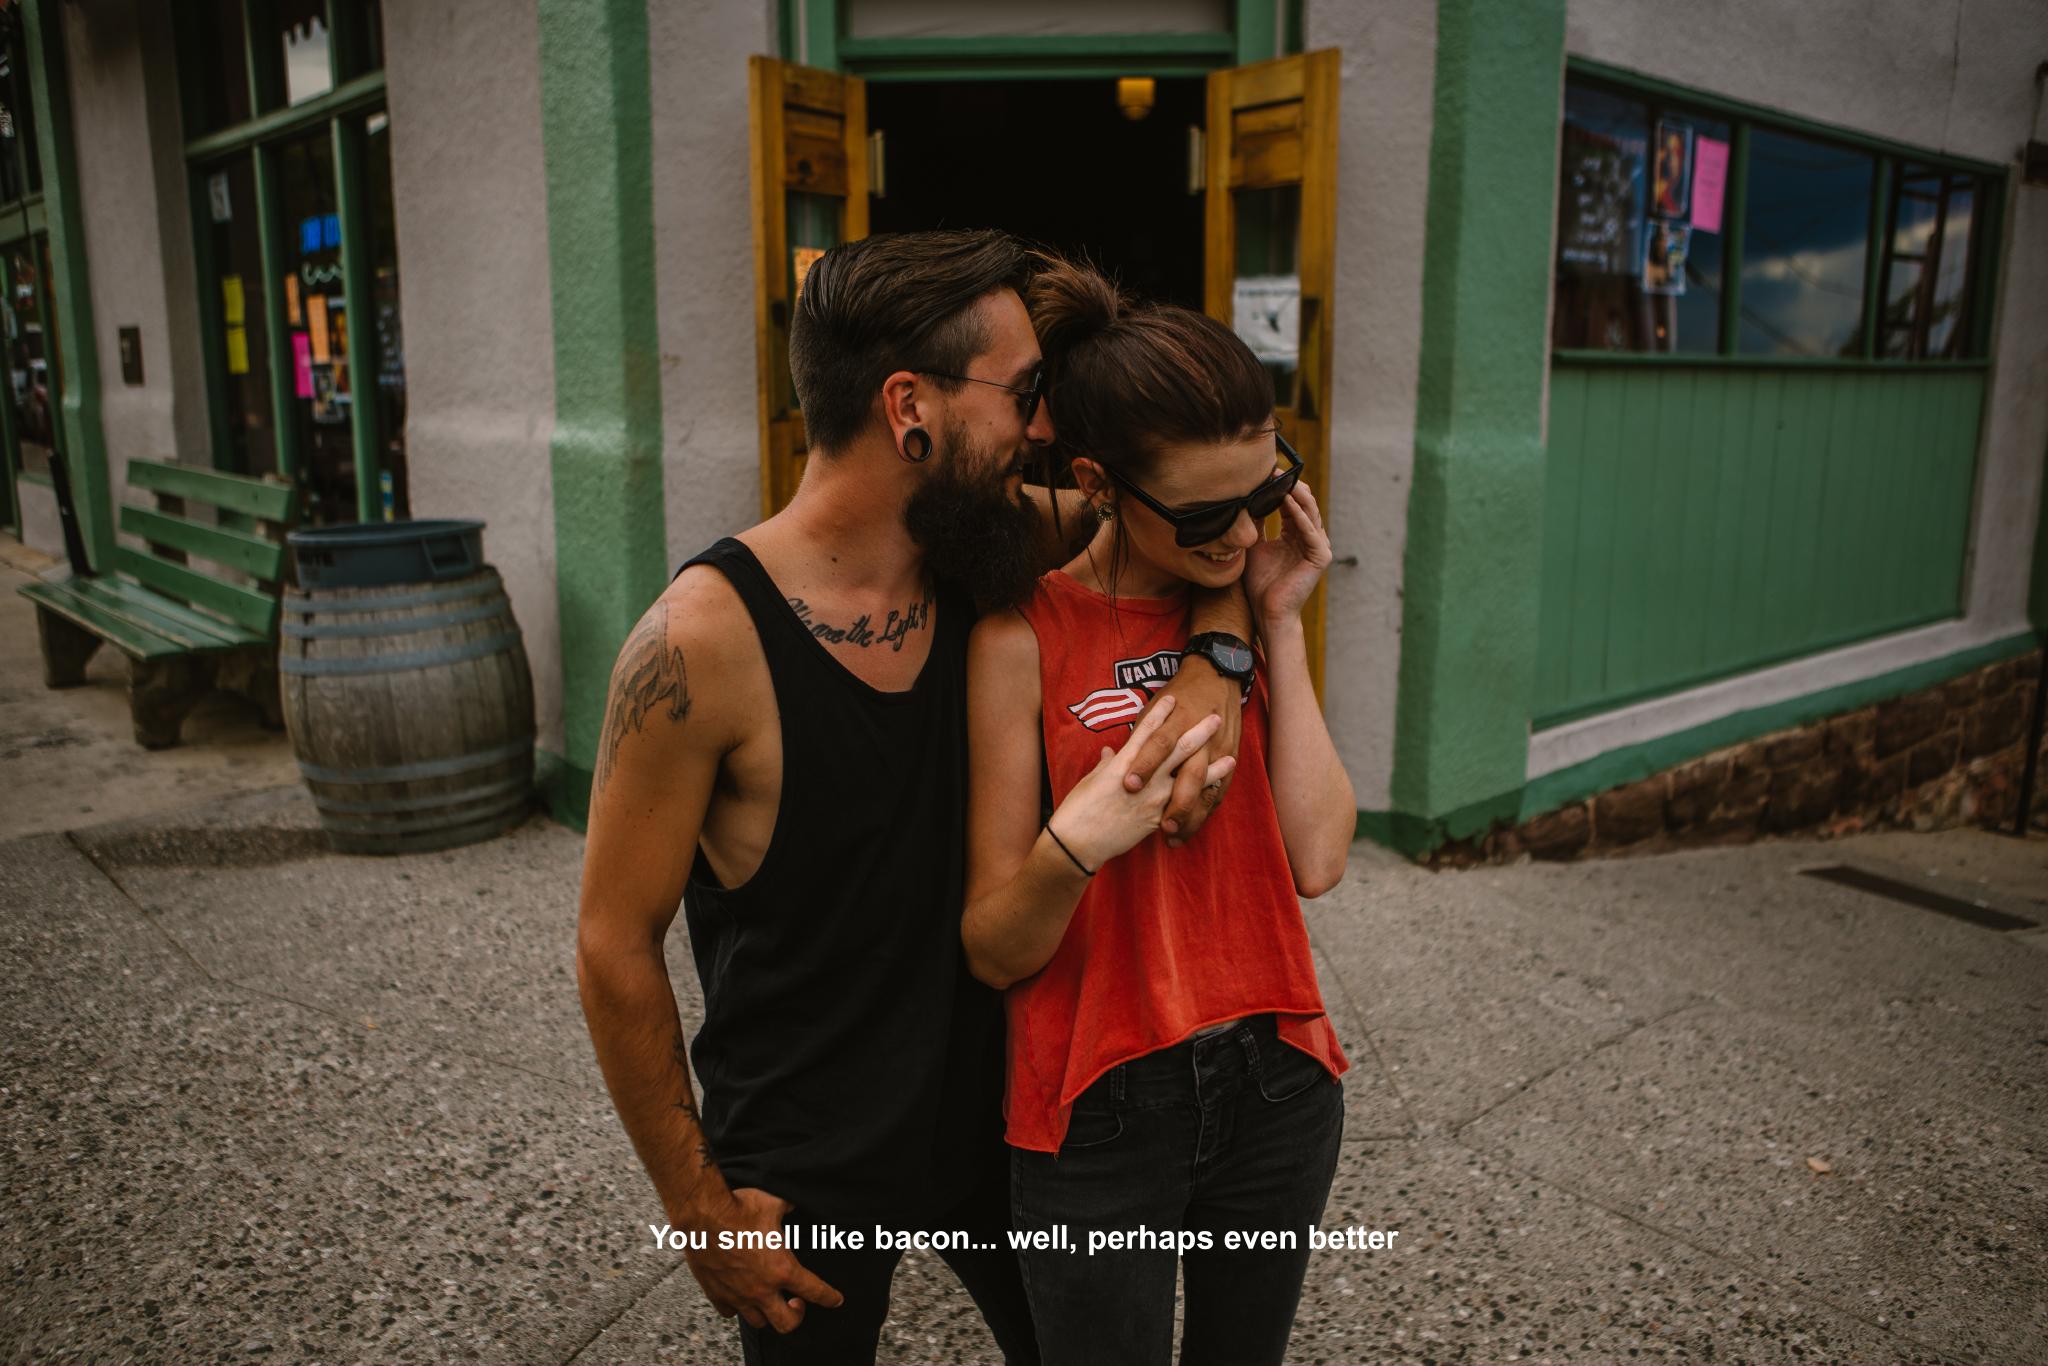 san diego wedding   photographer | bearded man's arm around woman's shoulder on street corner